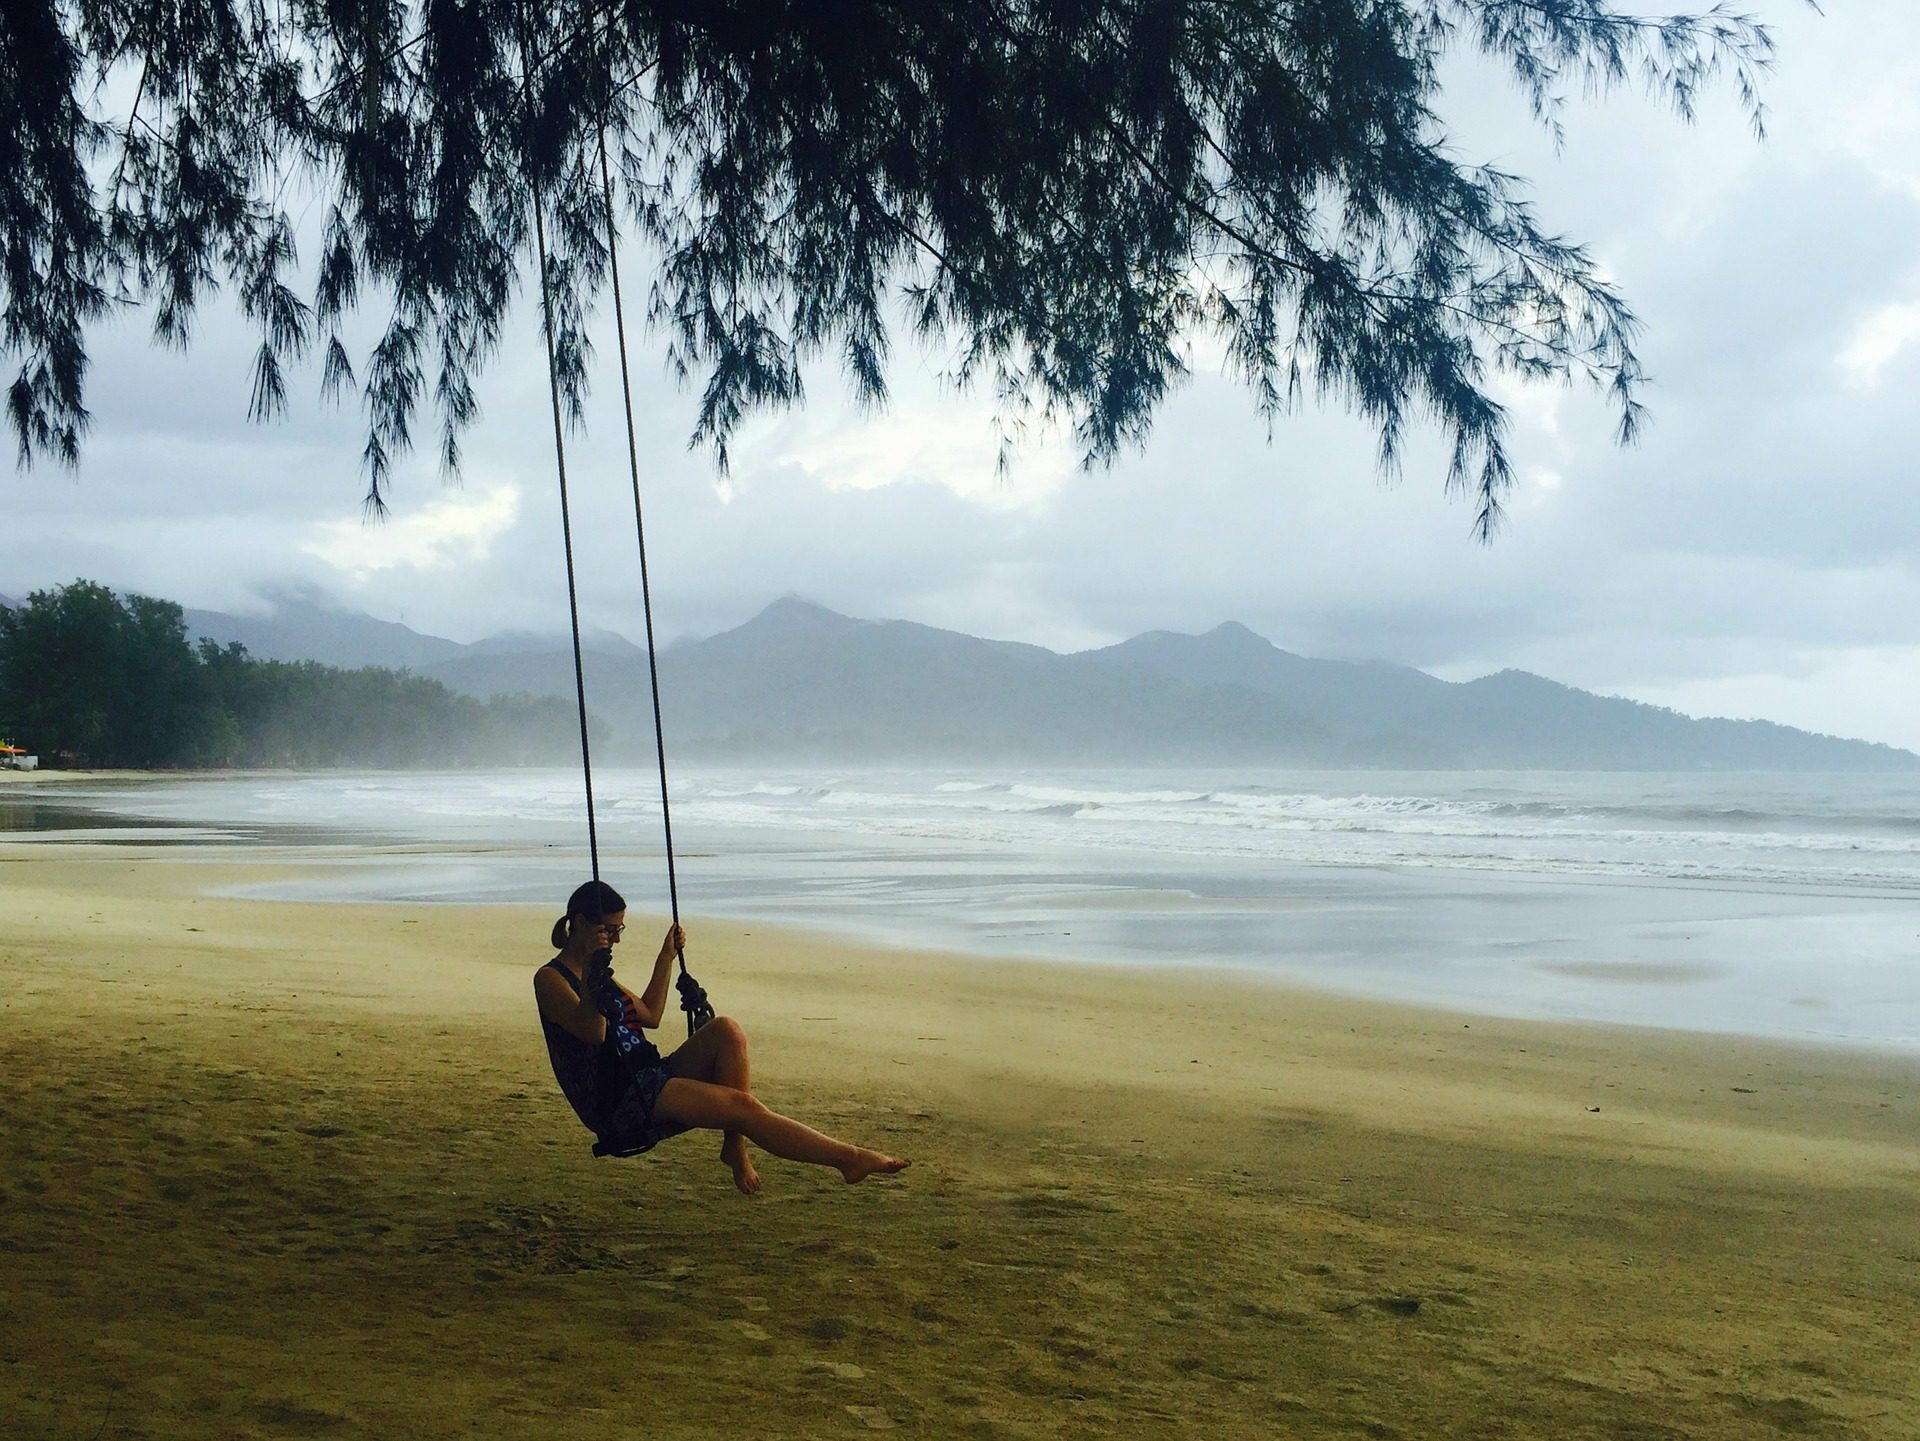 Spiaggia, sabbia, swing, corda, árbol, donna, rilassarsi - Sfondi HD - Professor-falken.com